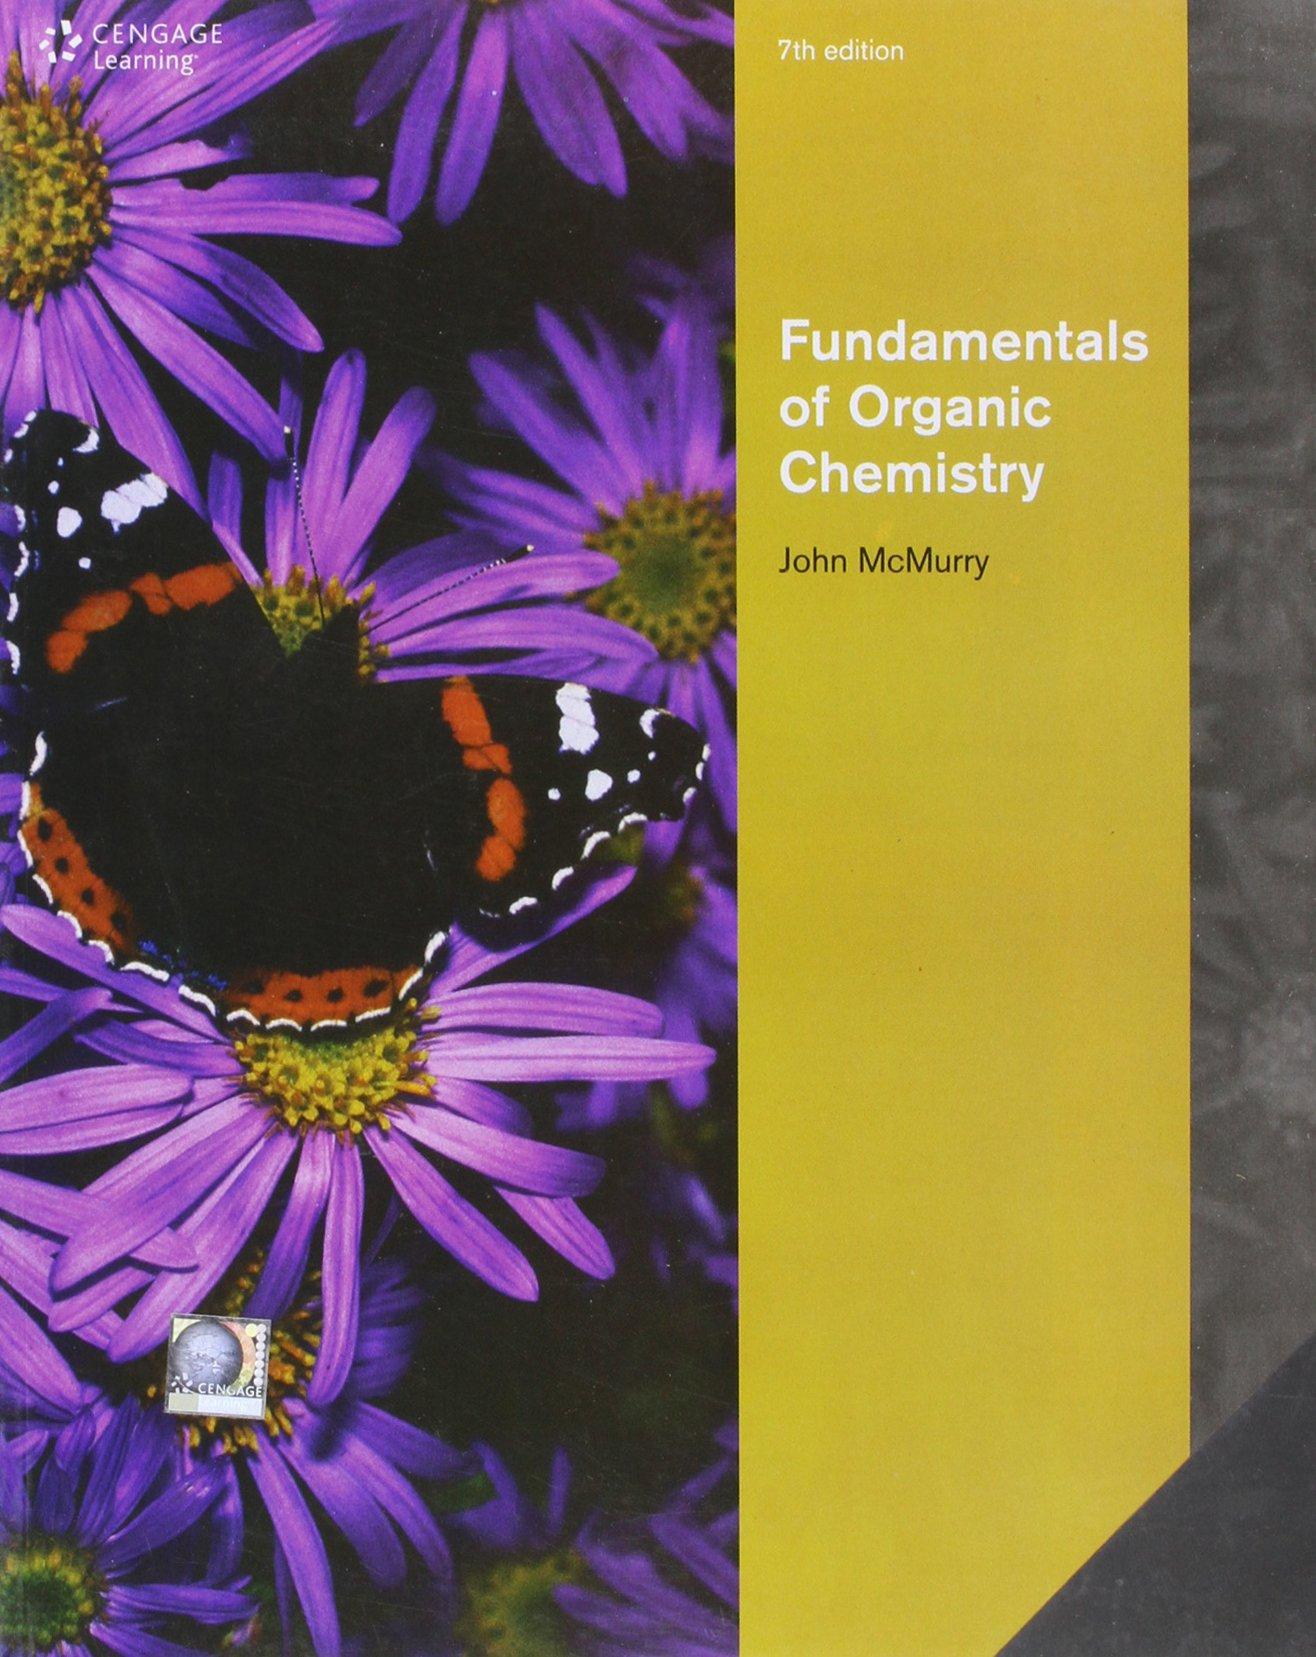 Fundamentals of Organic Chemistry: Amazon.co.uk: McMurry John E.:  9788131502372: Books